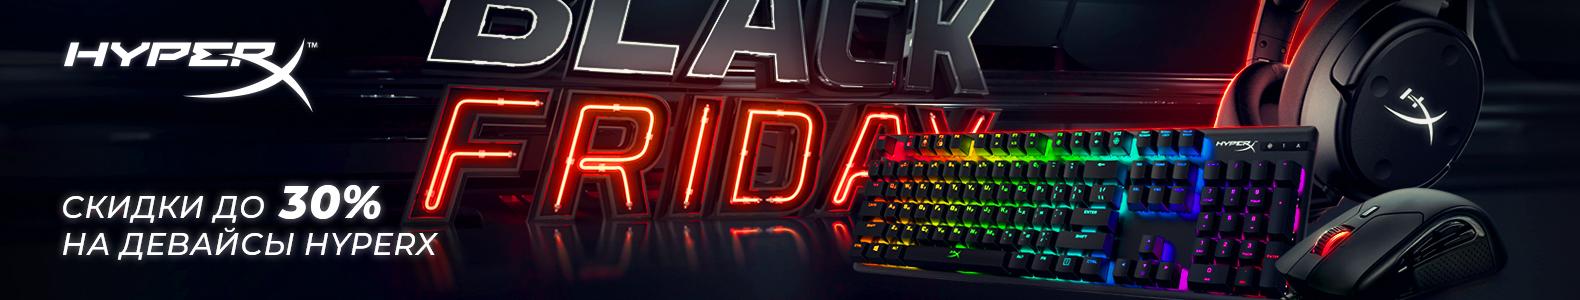 HyperX Black Friday